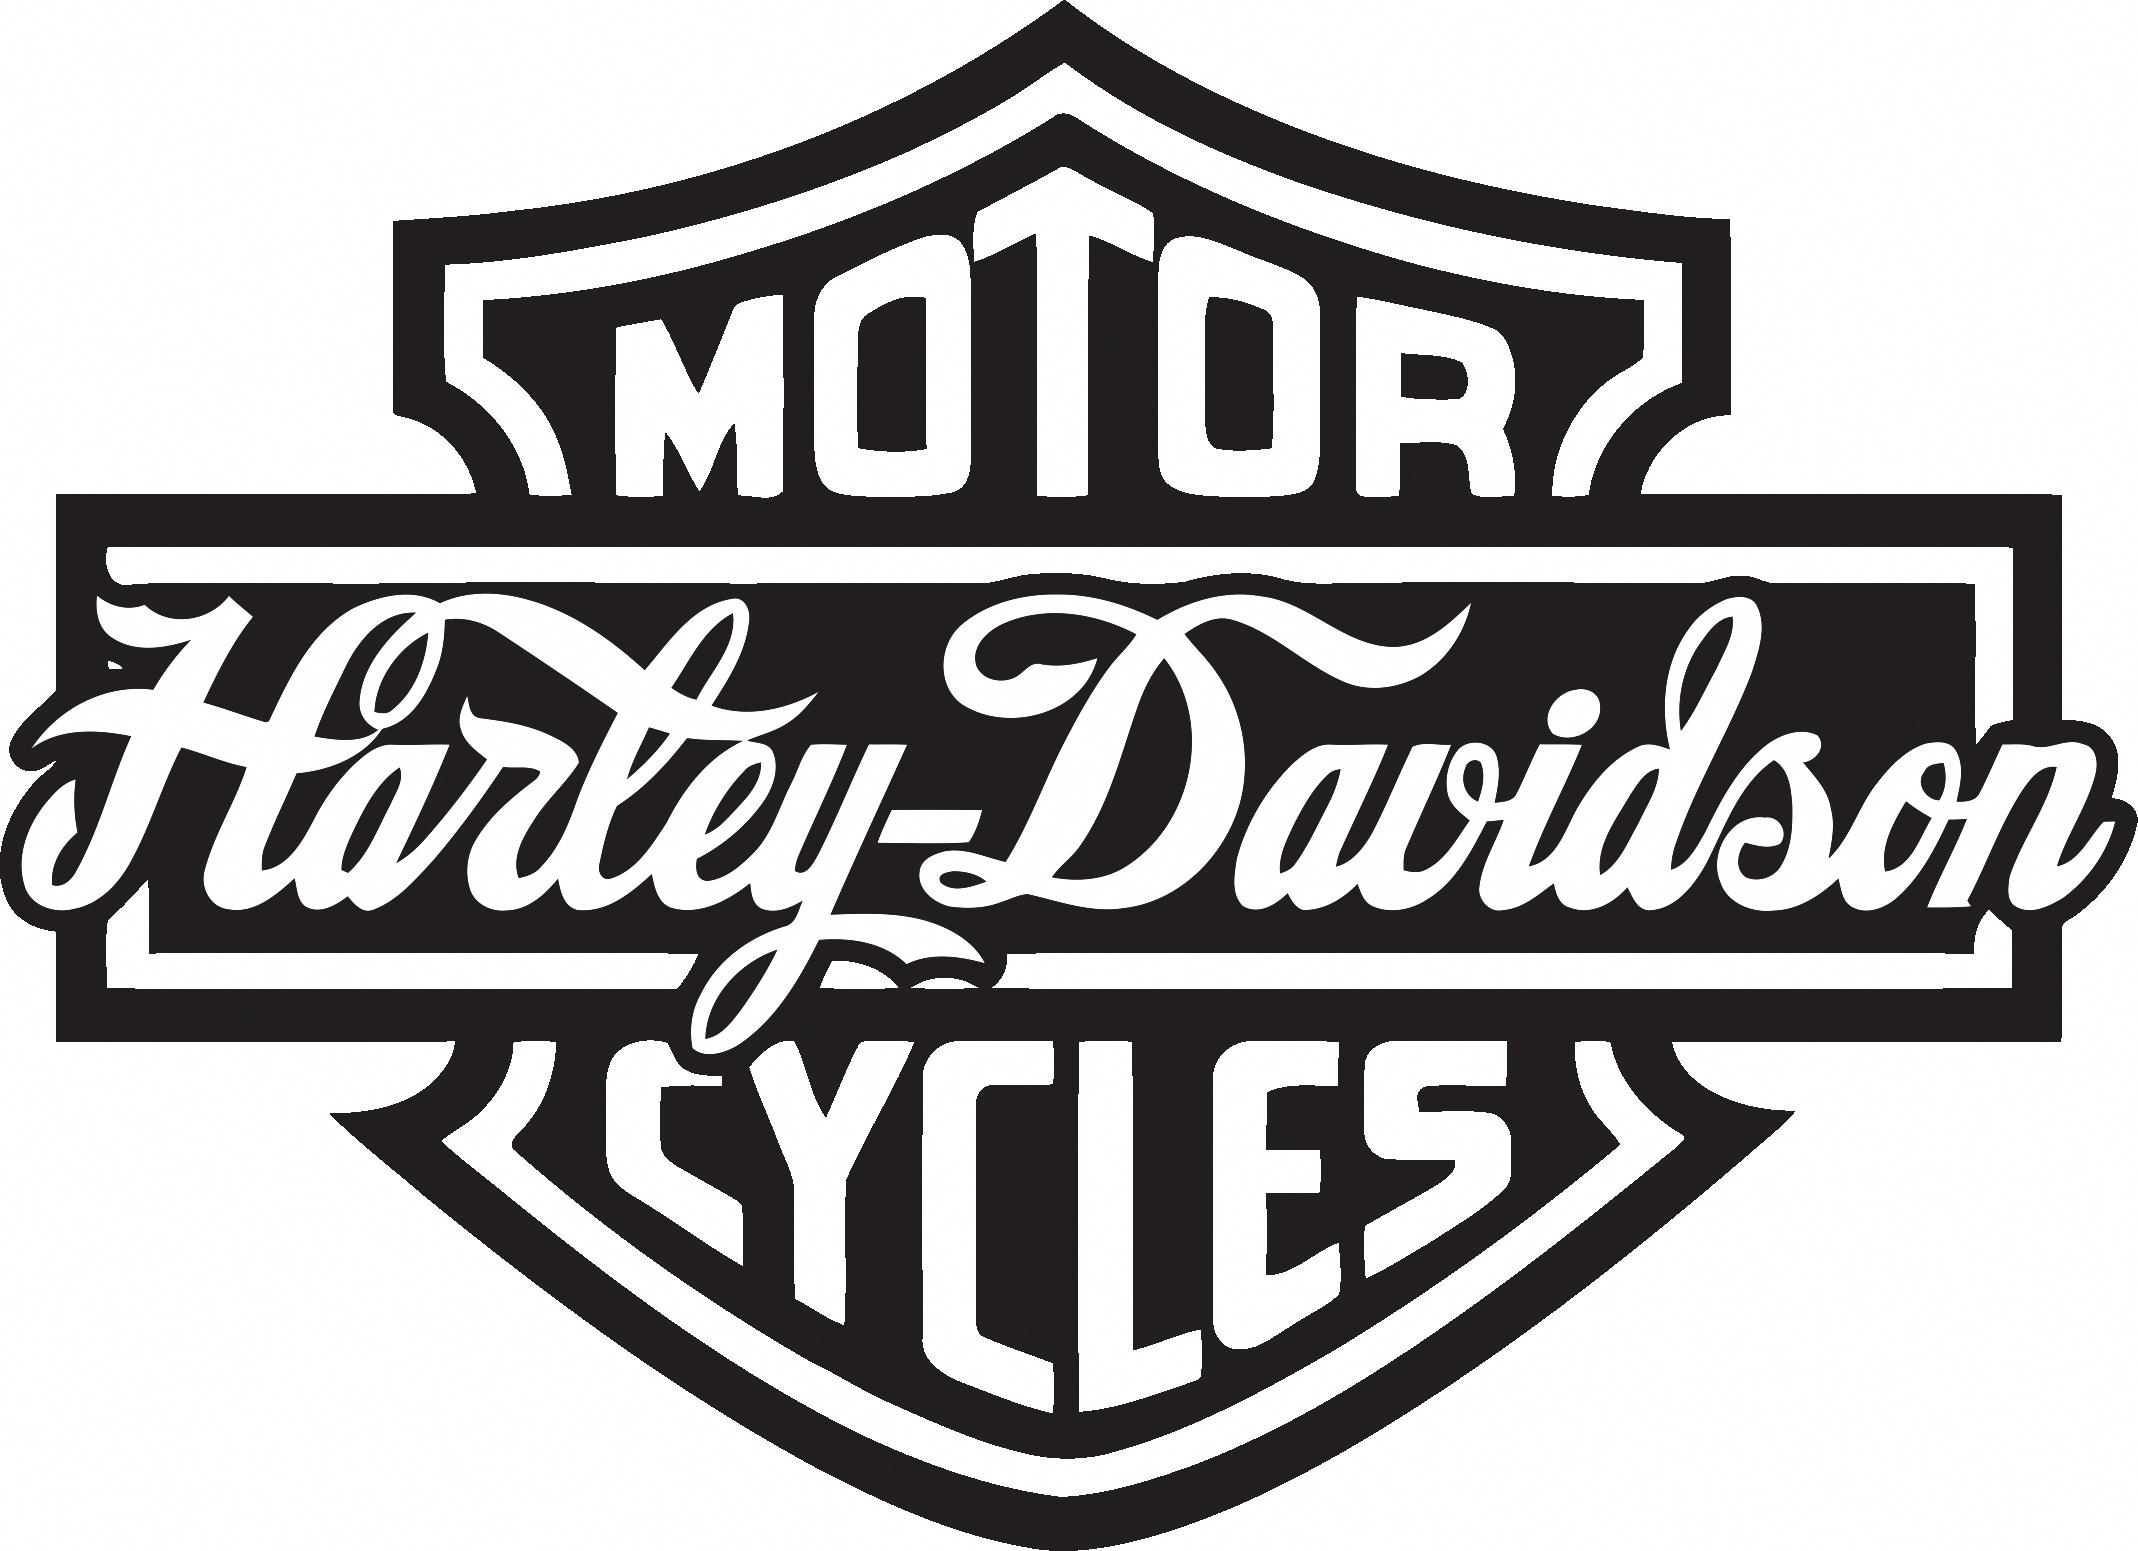 Old Classic HarleyDavidson Motorcycles Harley davidson